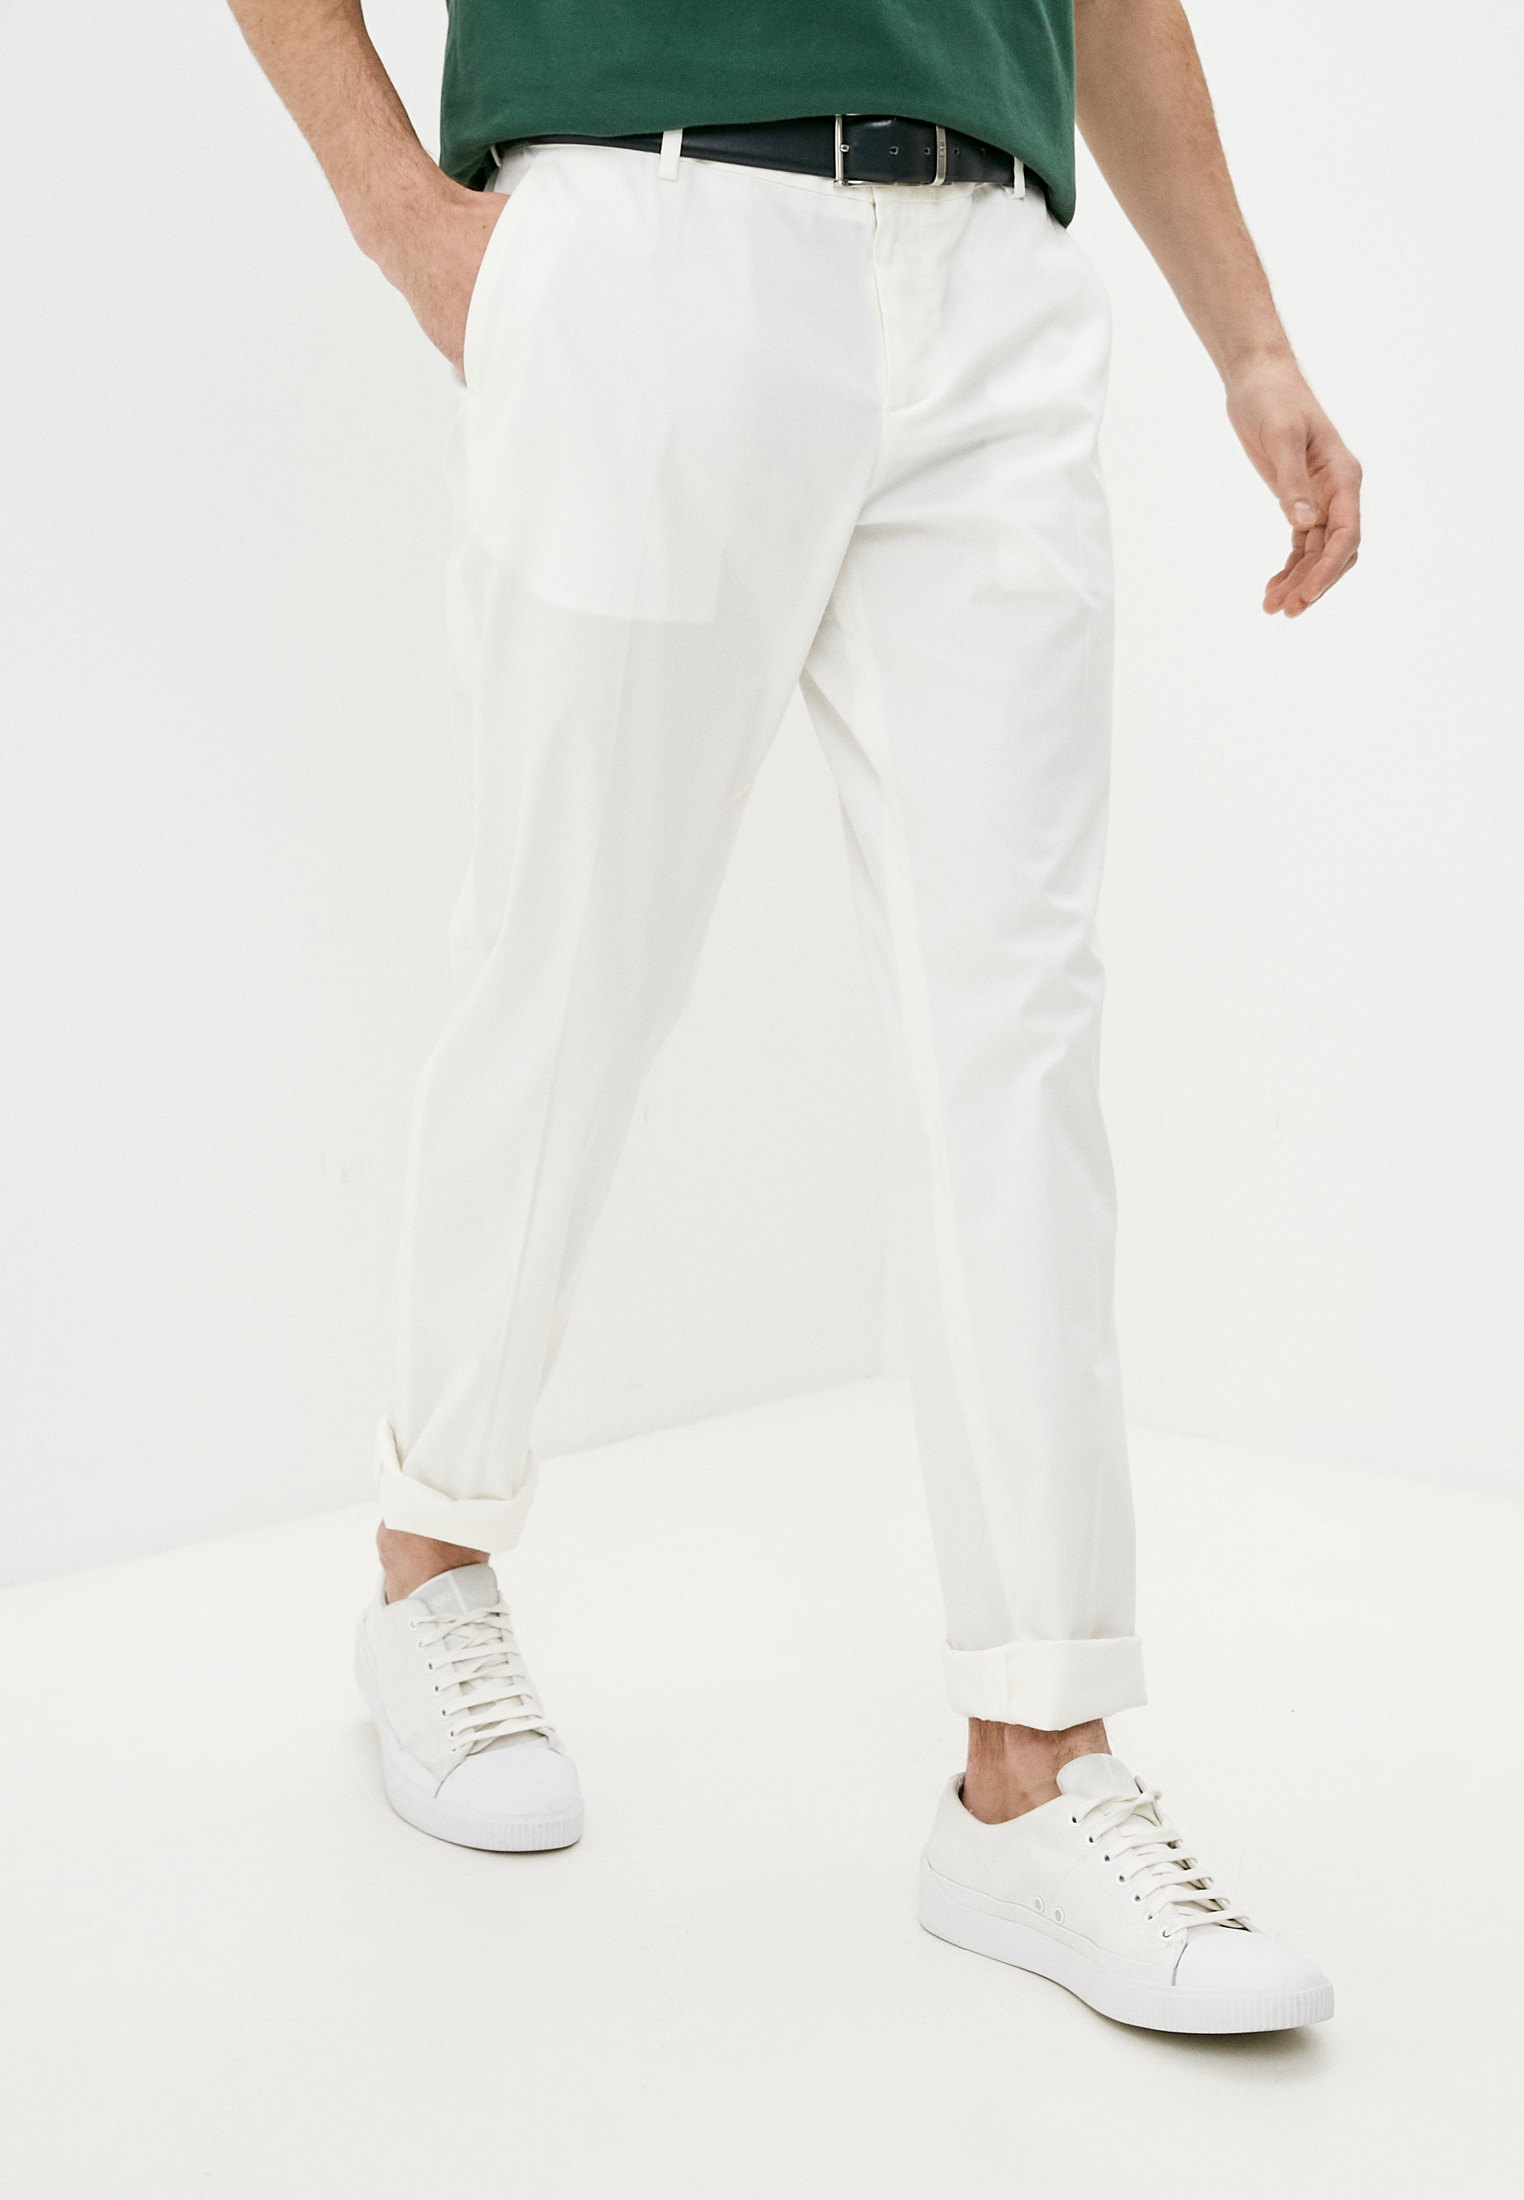 Мужские брюки Trussardi (Труссарди) Брюки Trussardi